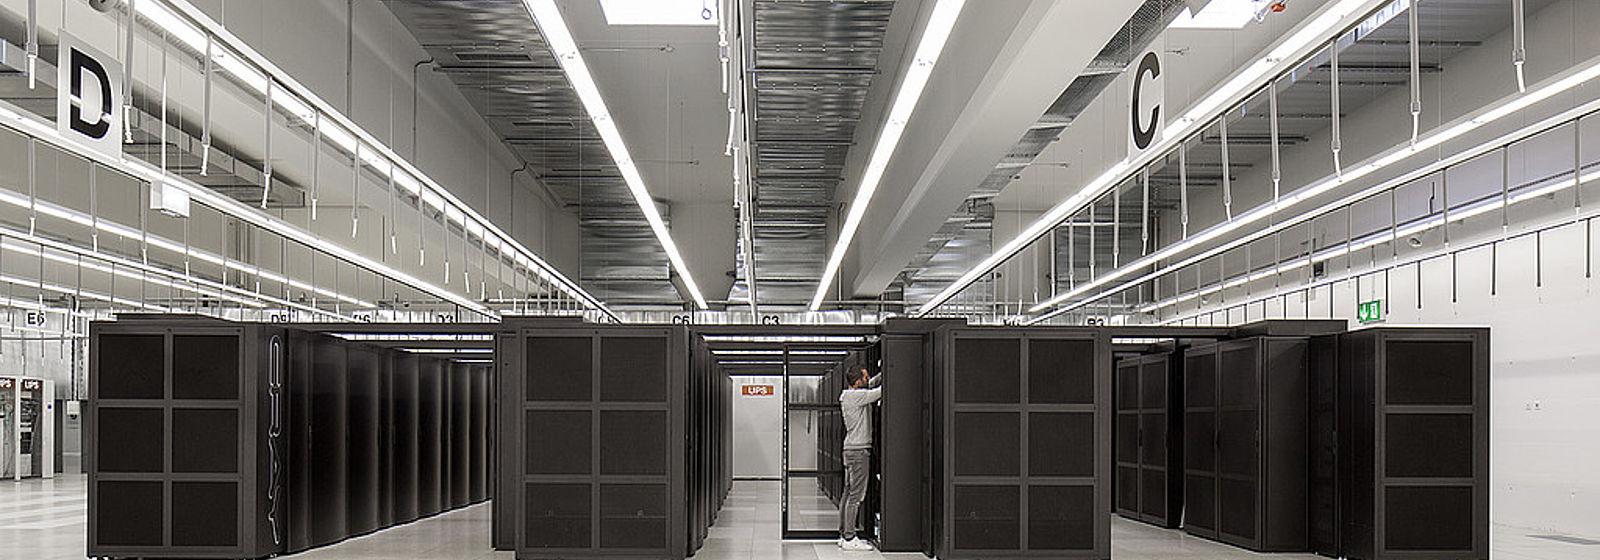 """Piz Daint"" takes on Tier 2 function in Worldwide LHC ..."